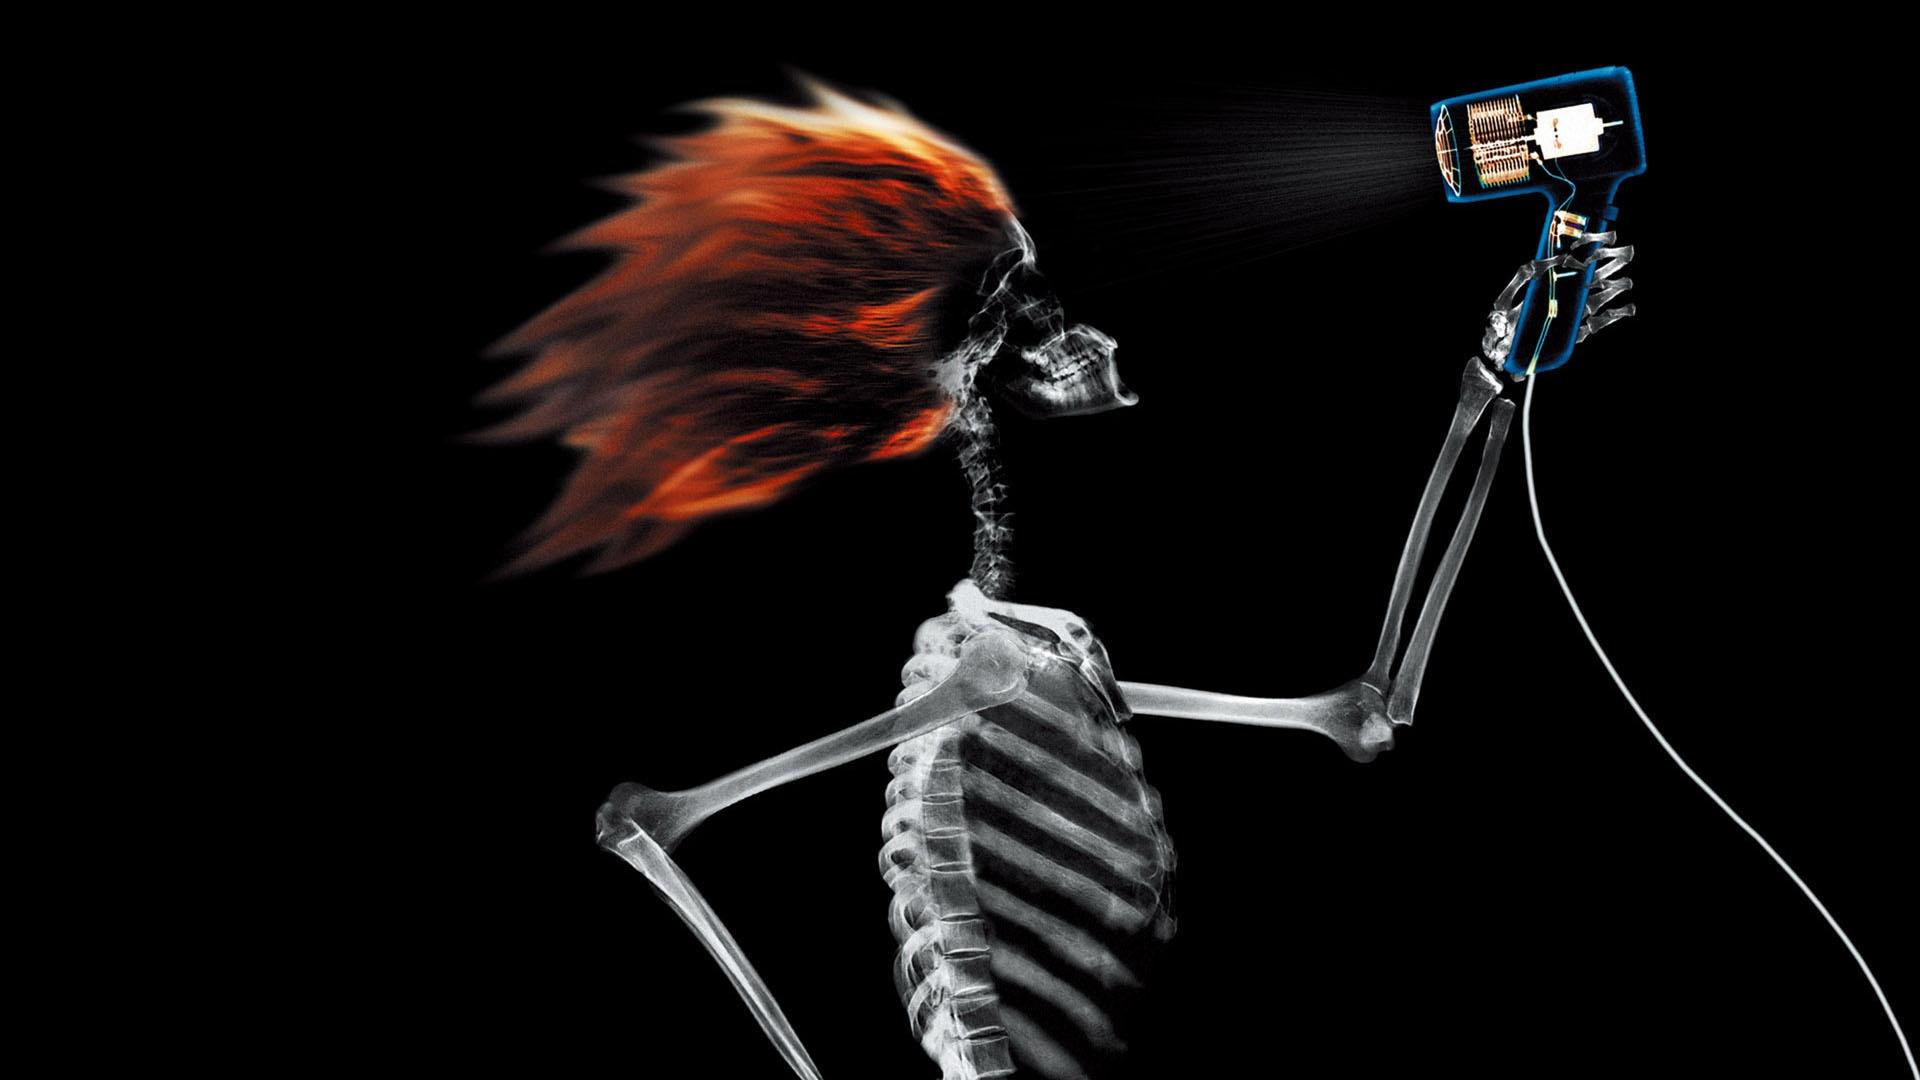 skeleton strange image